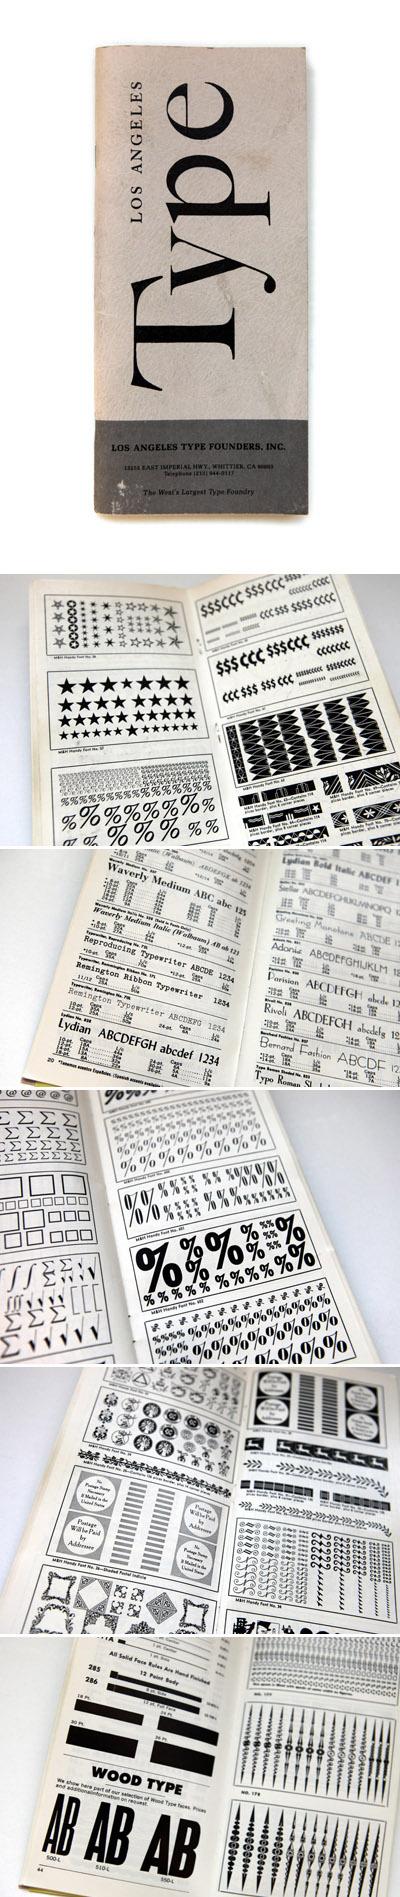 typecatalog